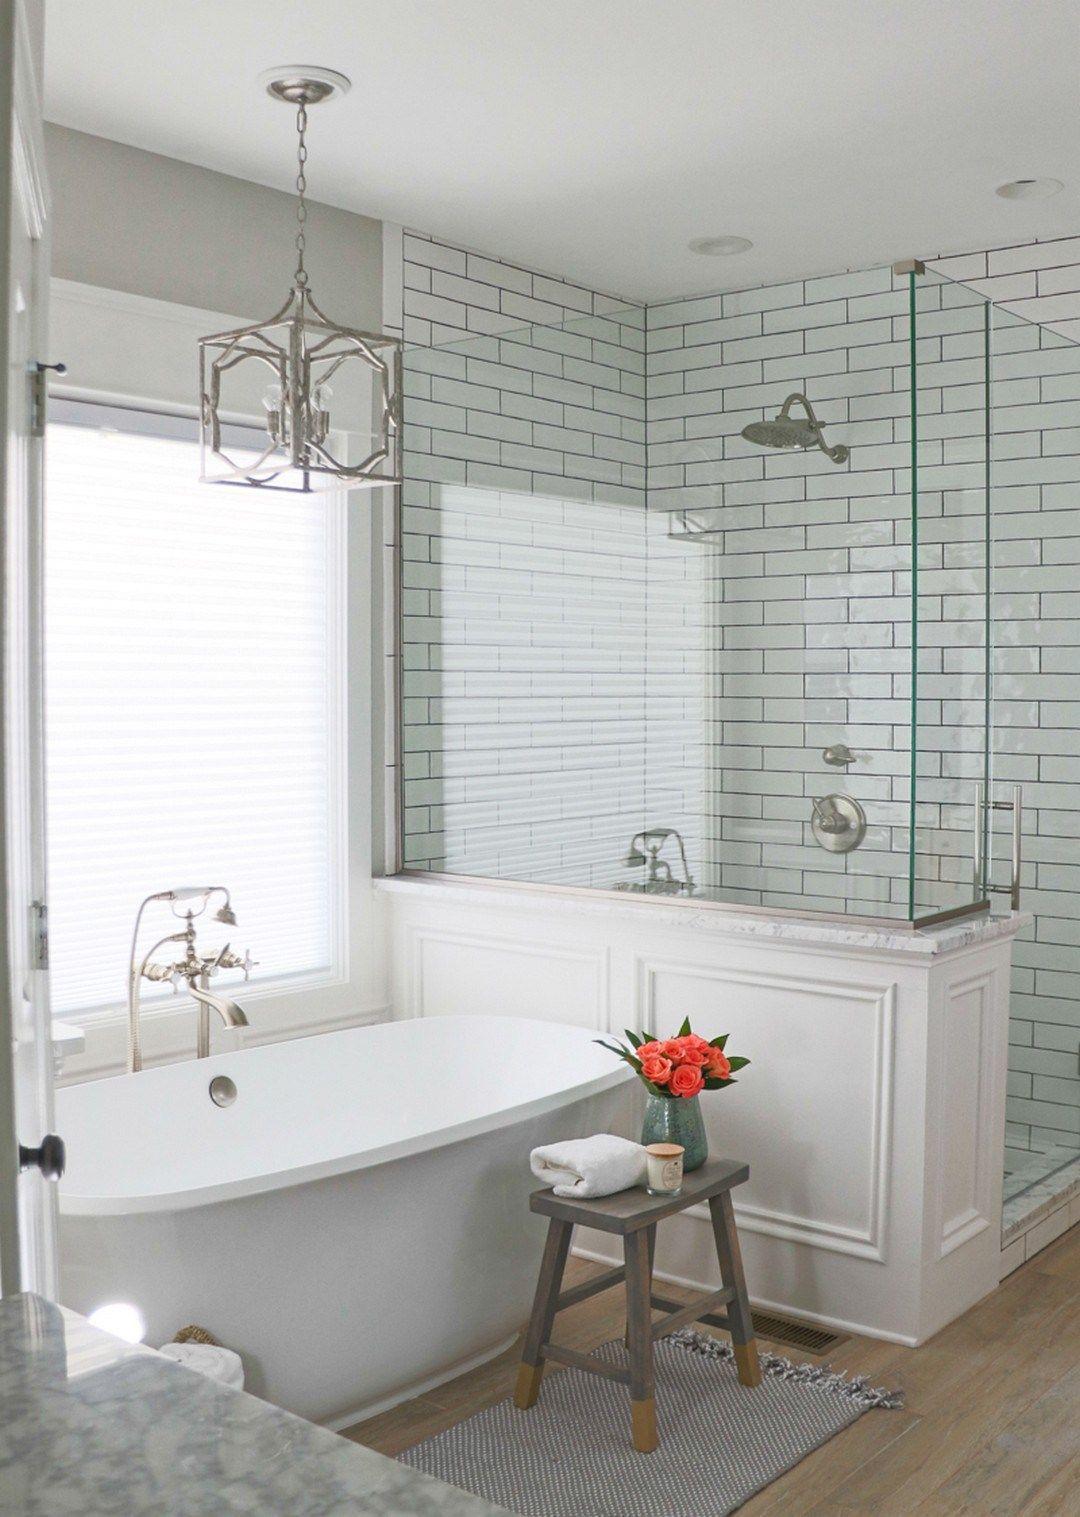 Image result for master bath farmhouse remodel | Master Bath Remodel ...